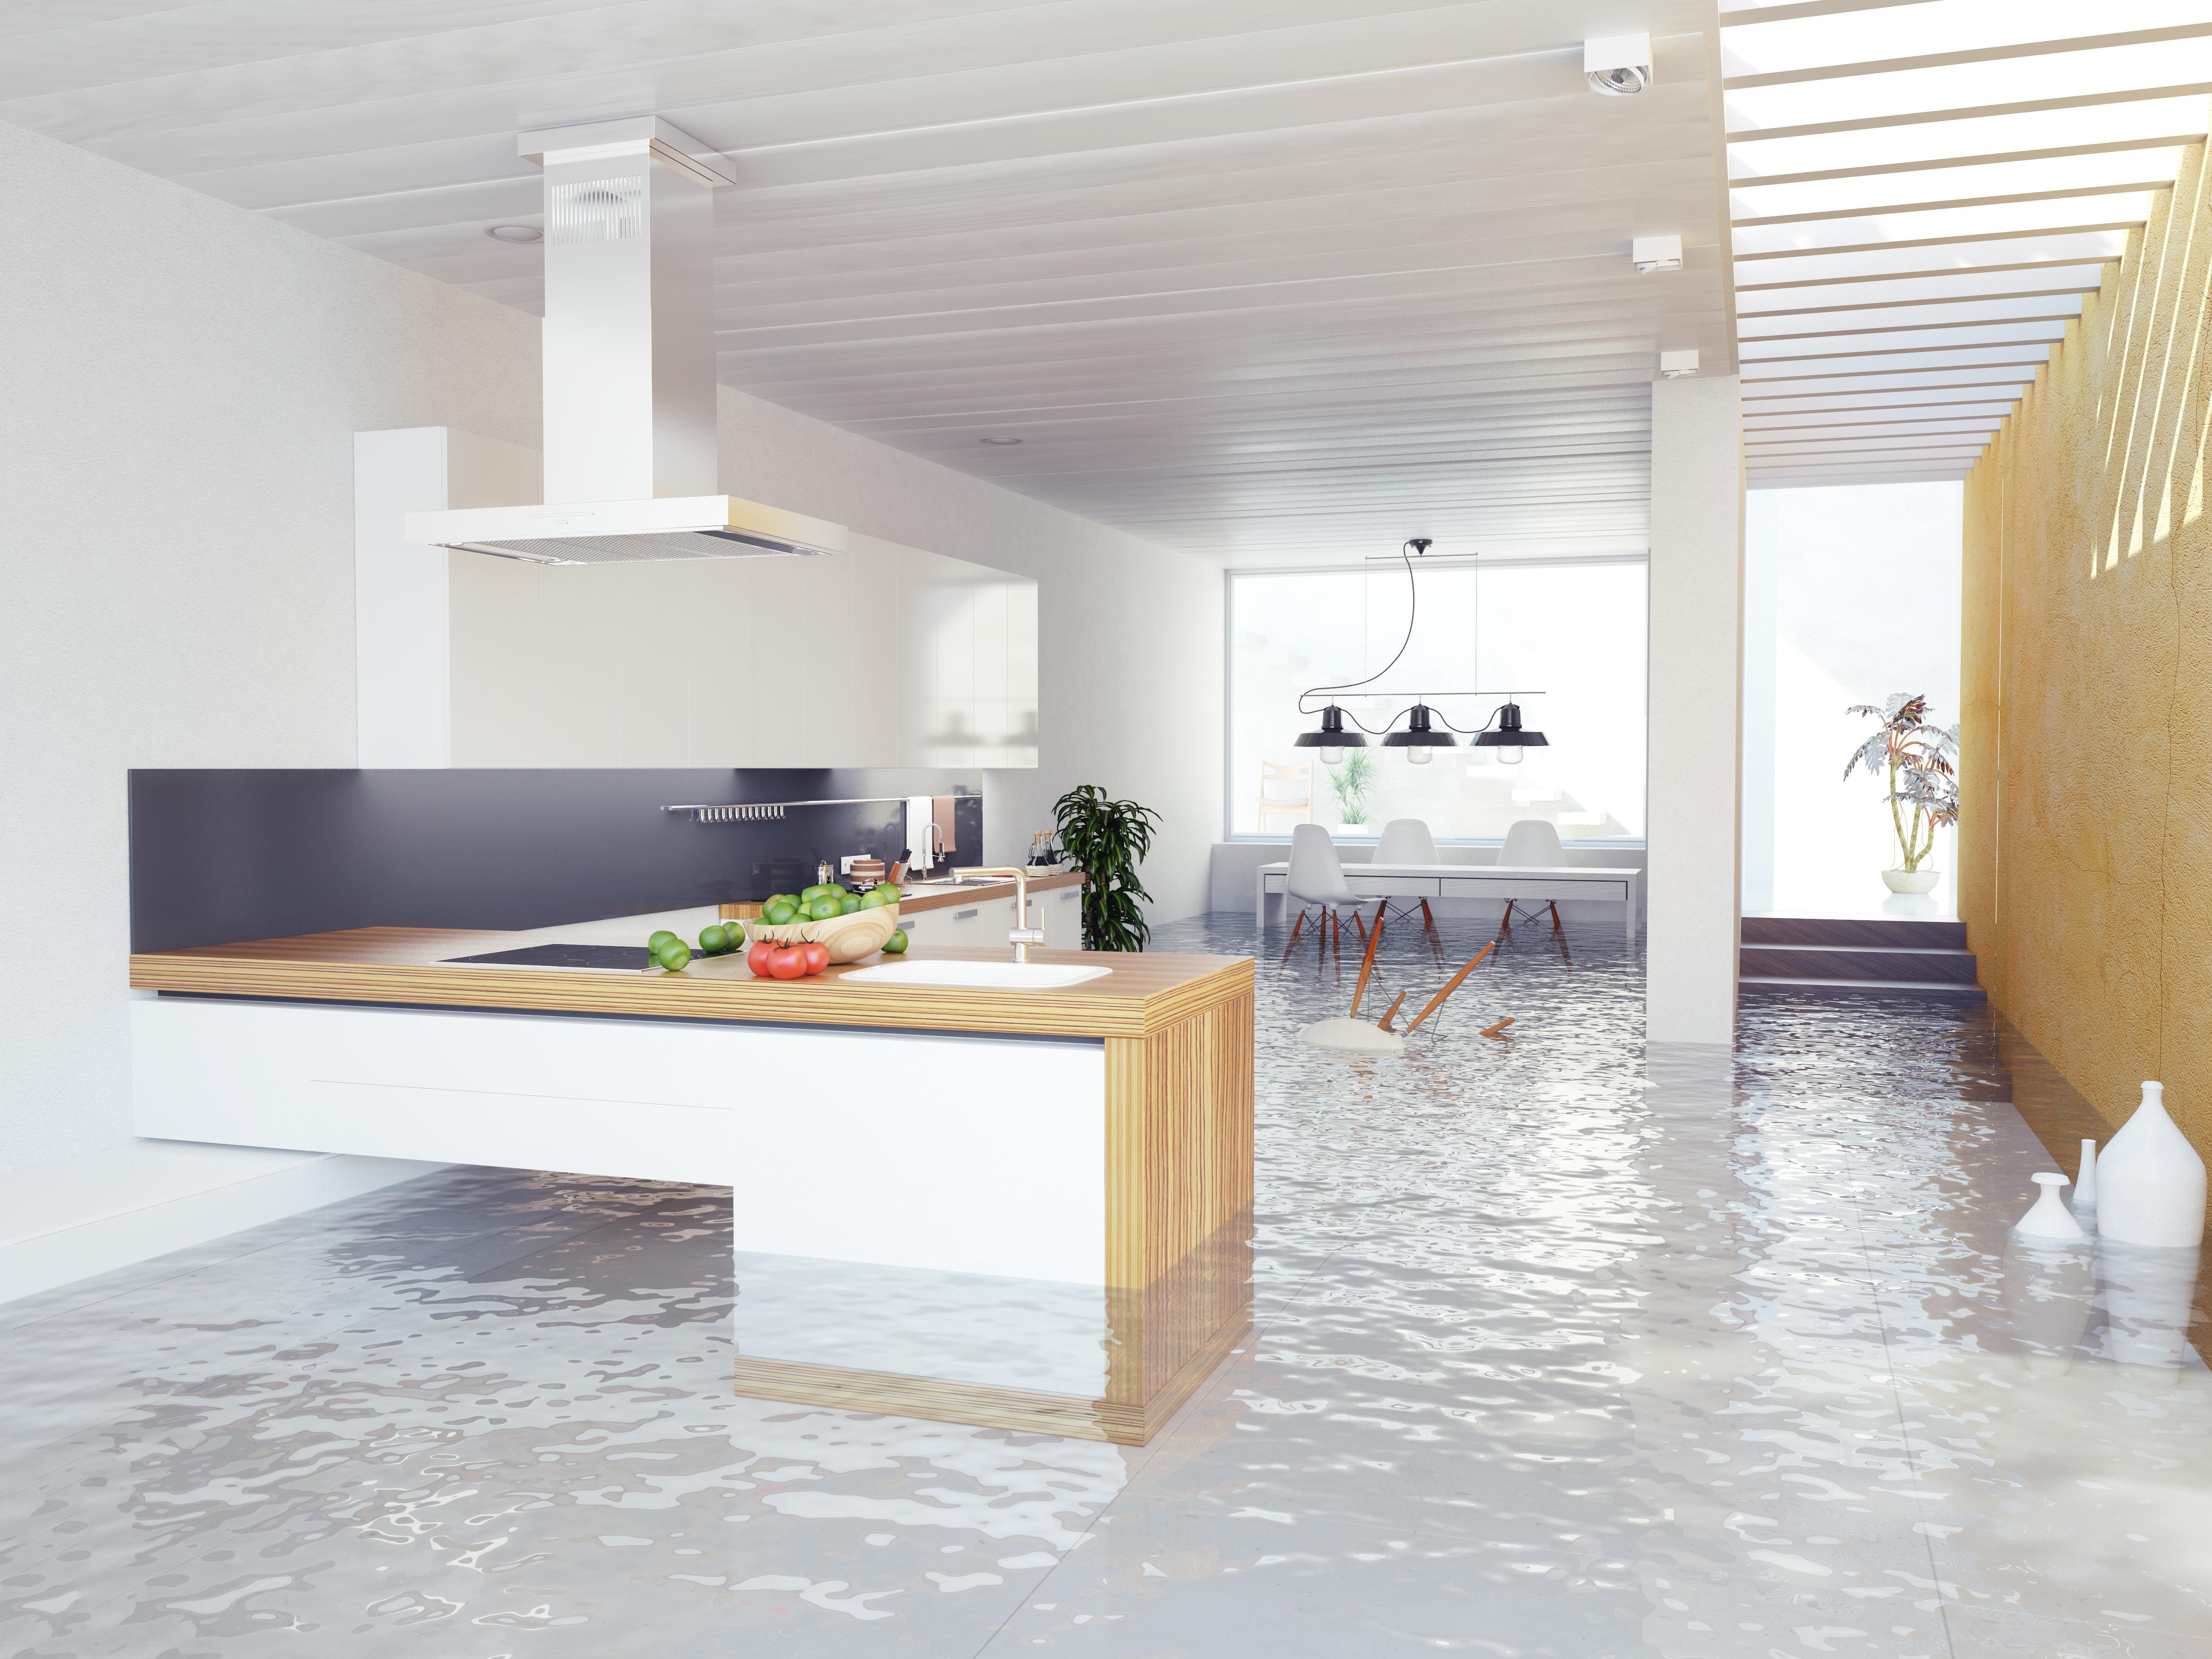 house flood insurance claim attorney